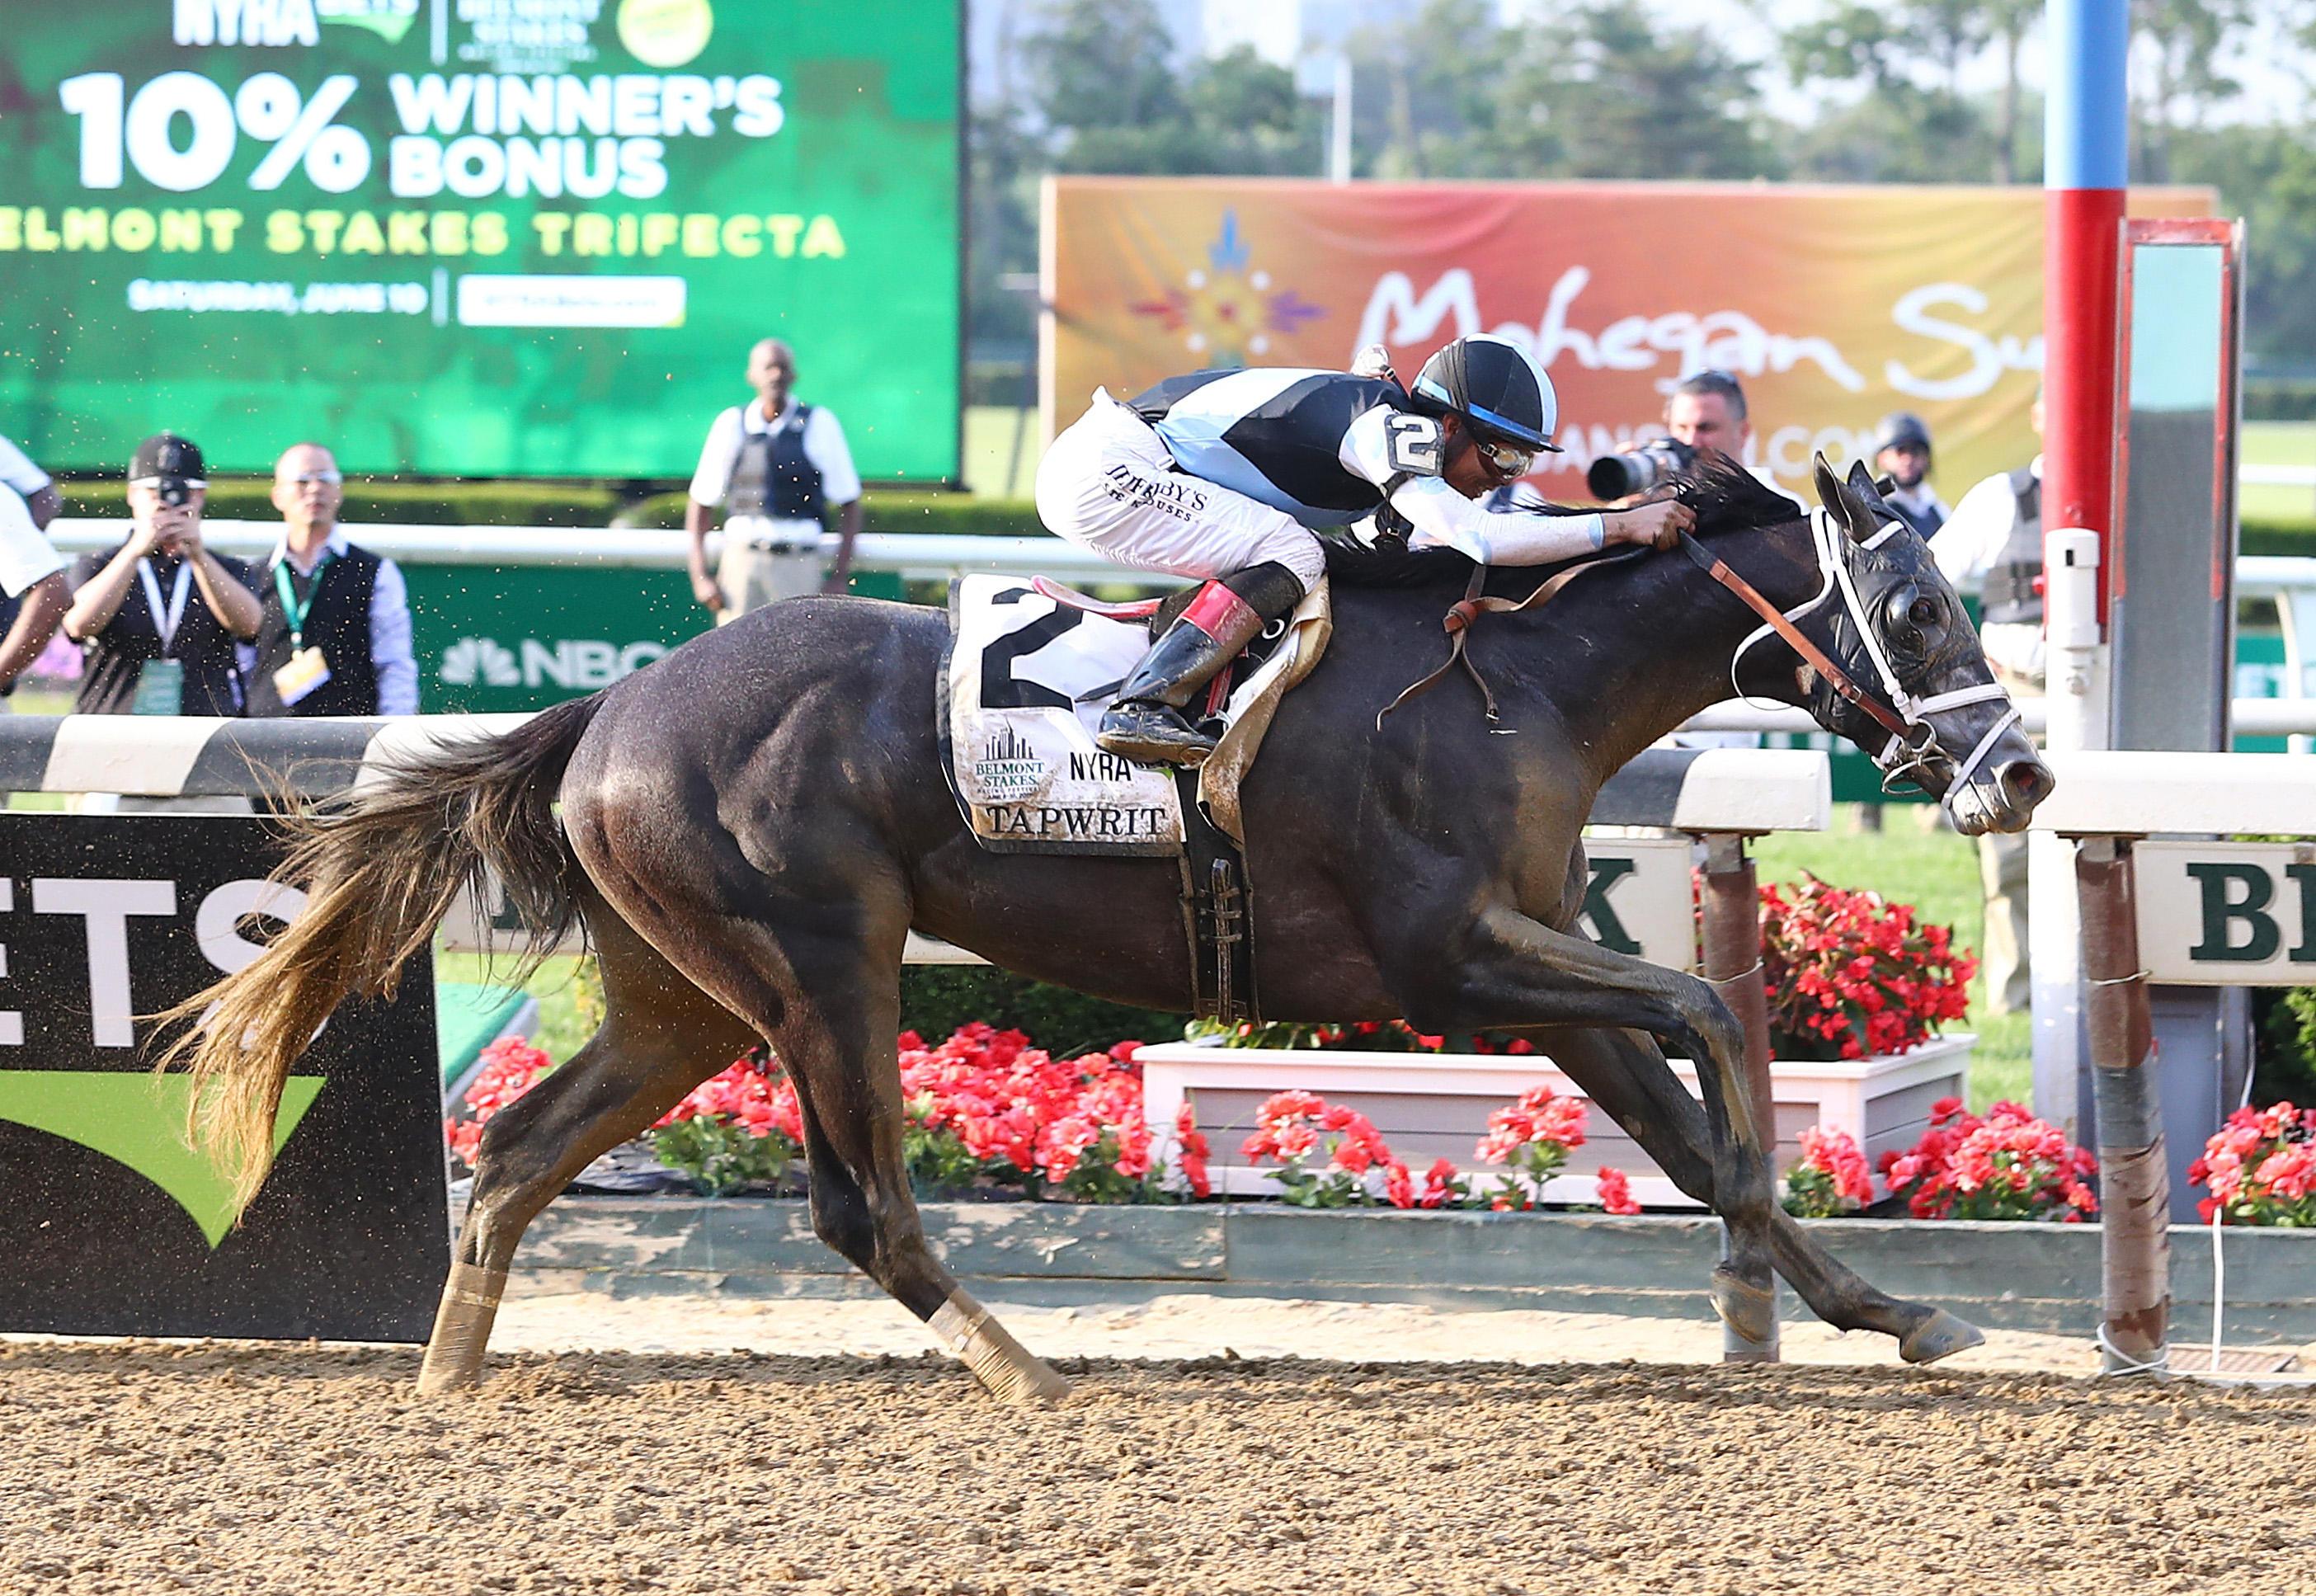 Tapwrit Wins 2017 Belmont Stakes Cbs News